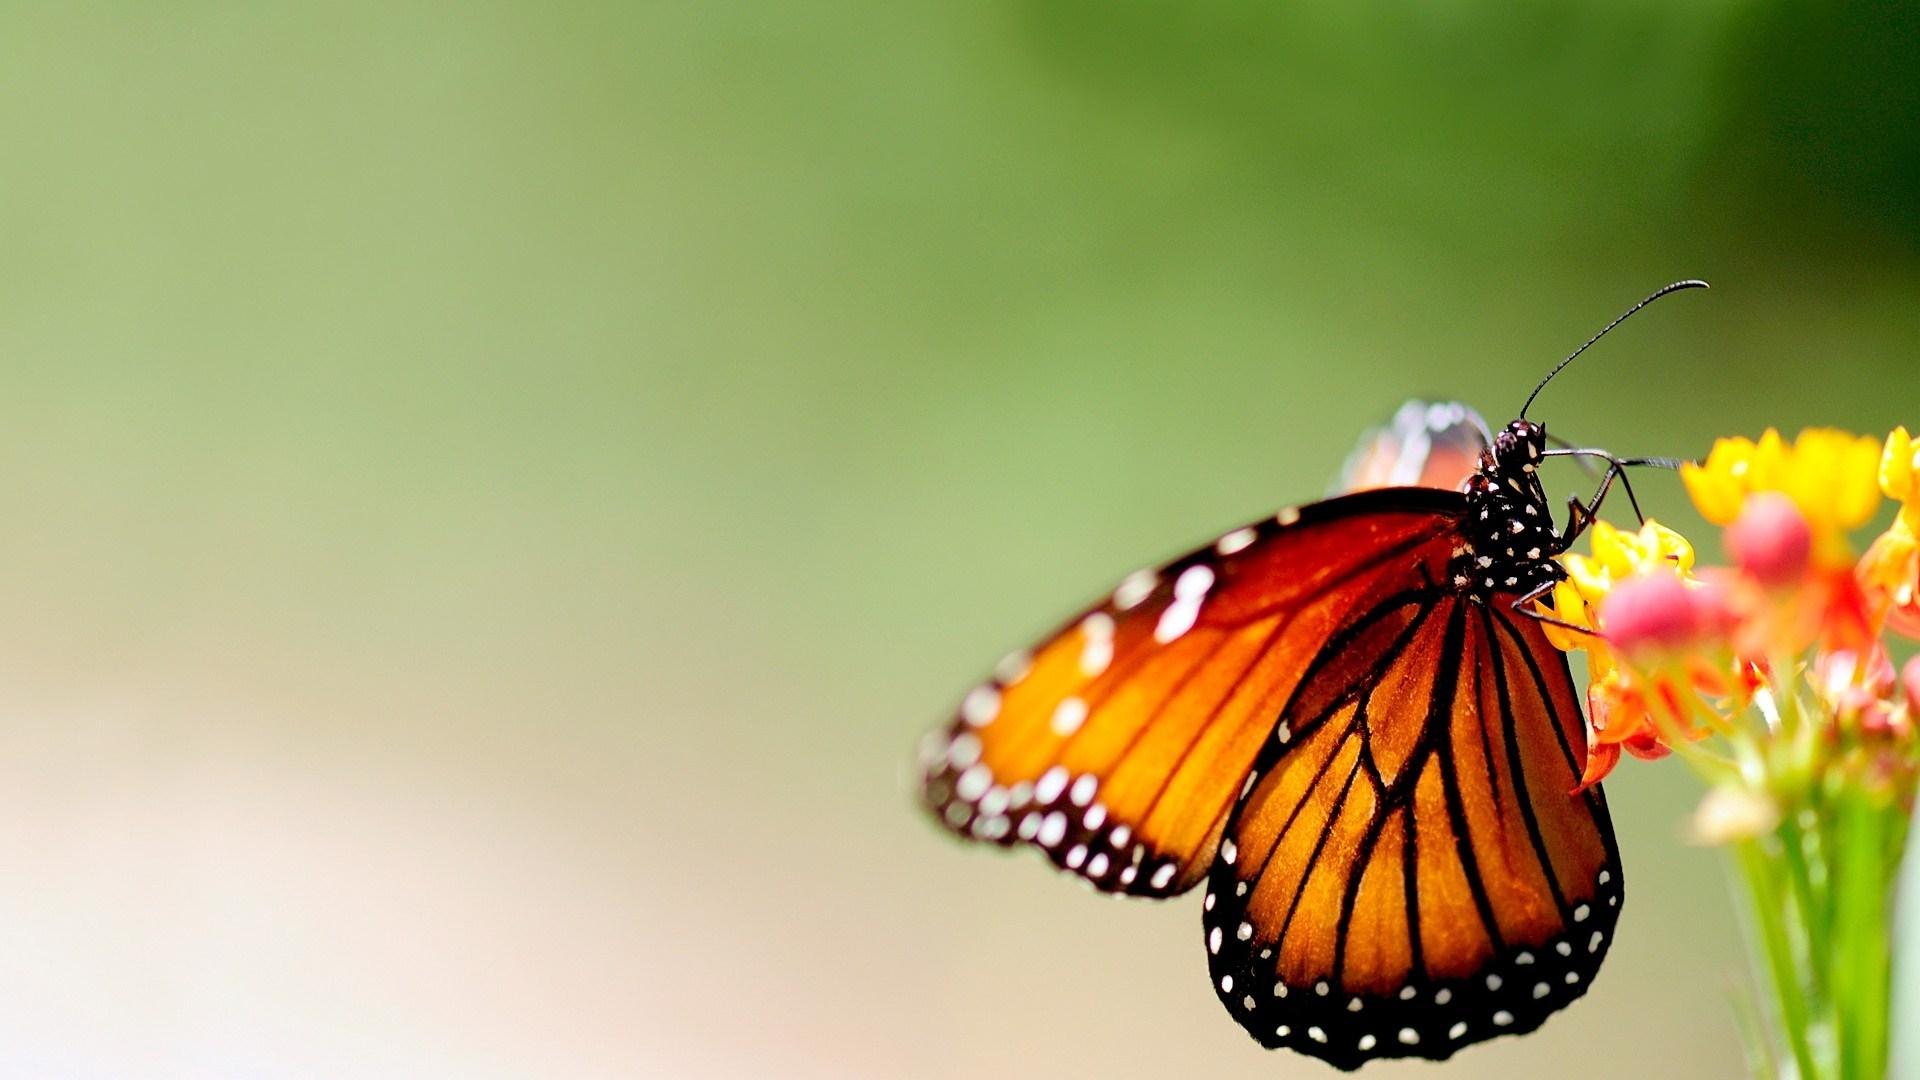 Farfalla hd wallpaper sfondi 1920x1080 id 469662 for Sfondi con farfalle